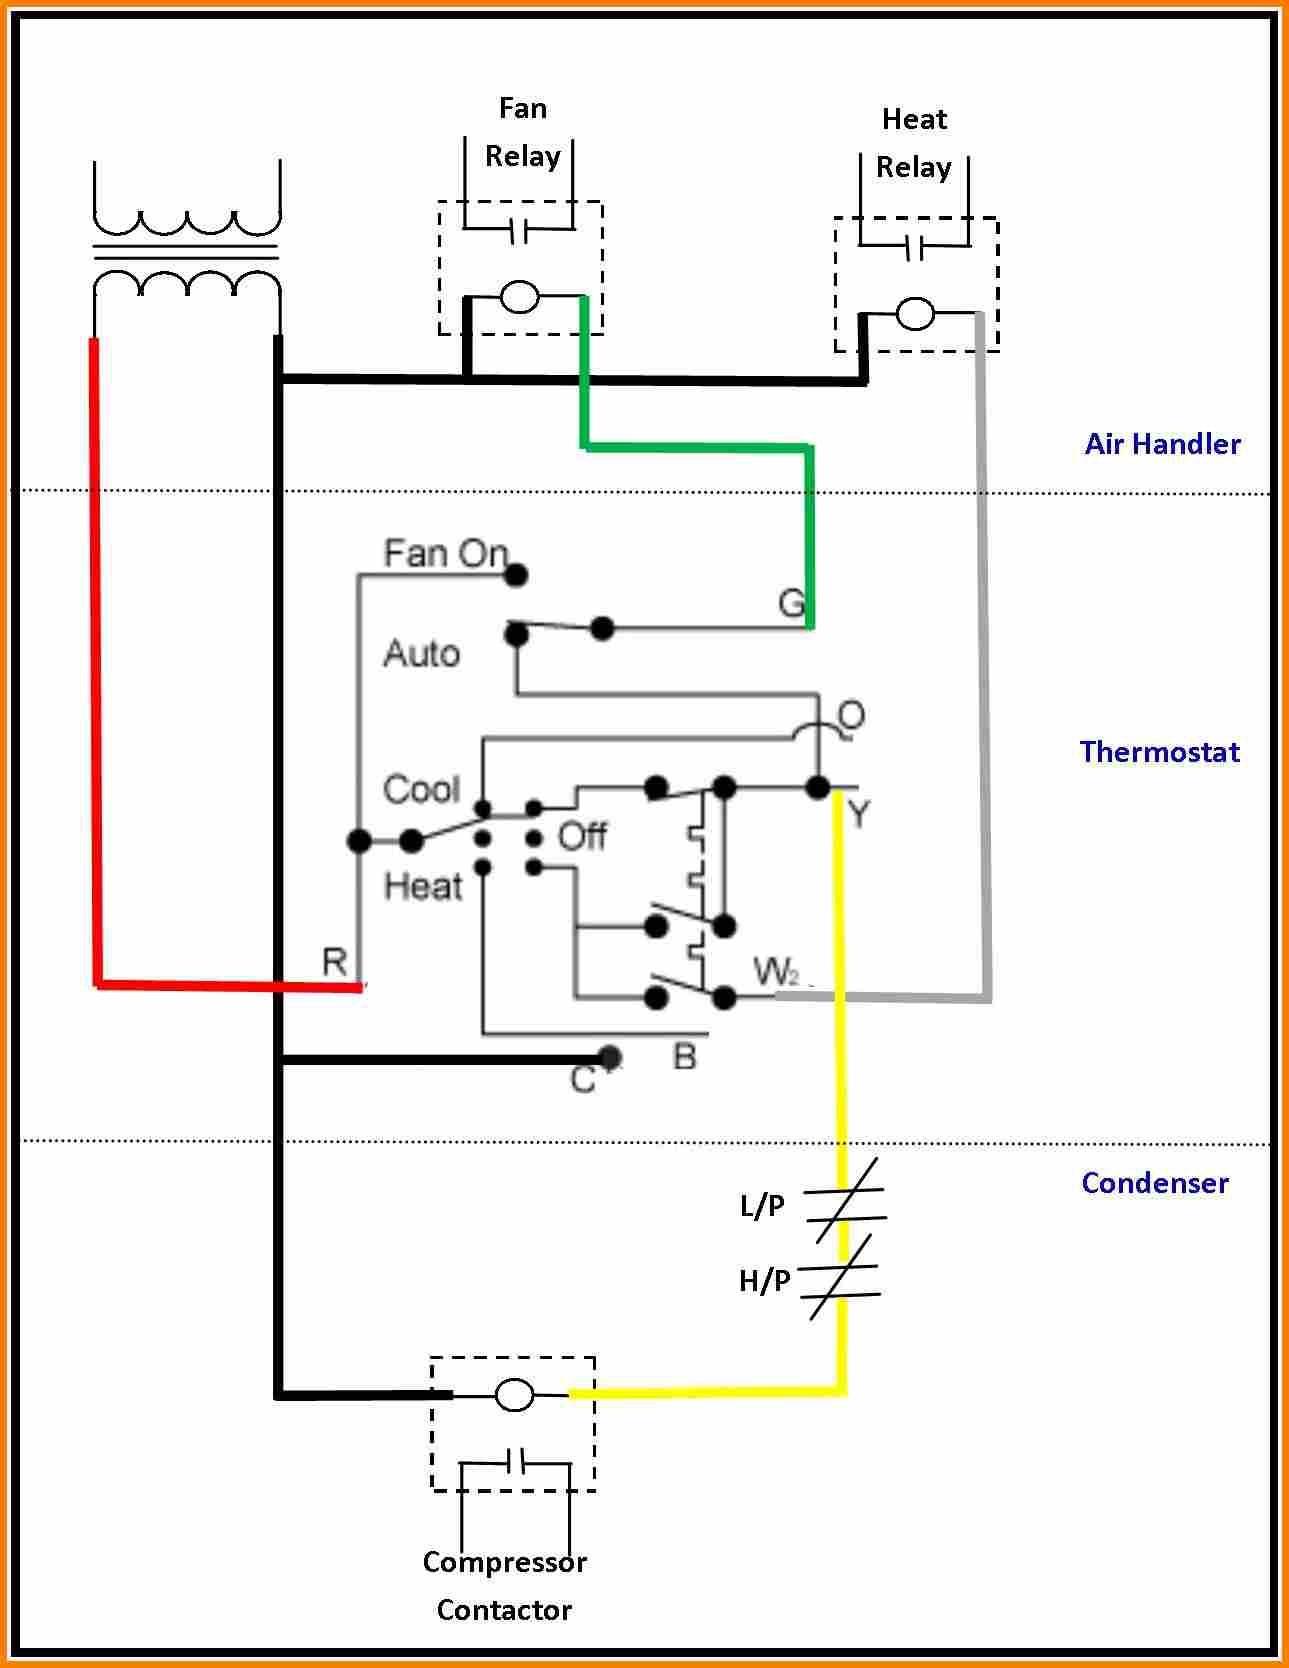 Electric Heat Strip Wiring Diagram Elegant Unusual Hvac Thermostat 13